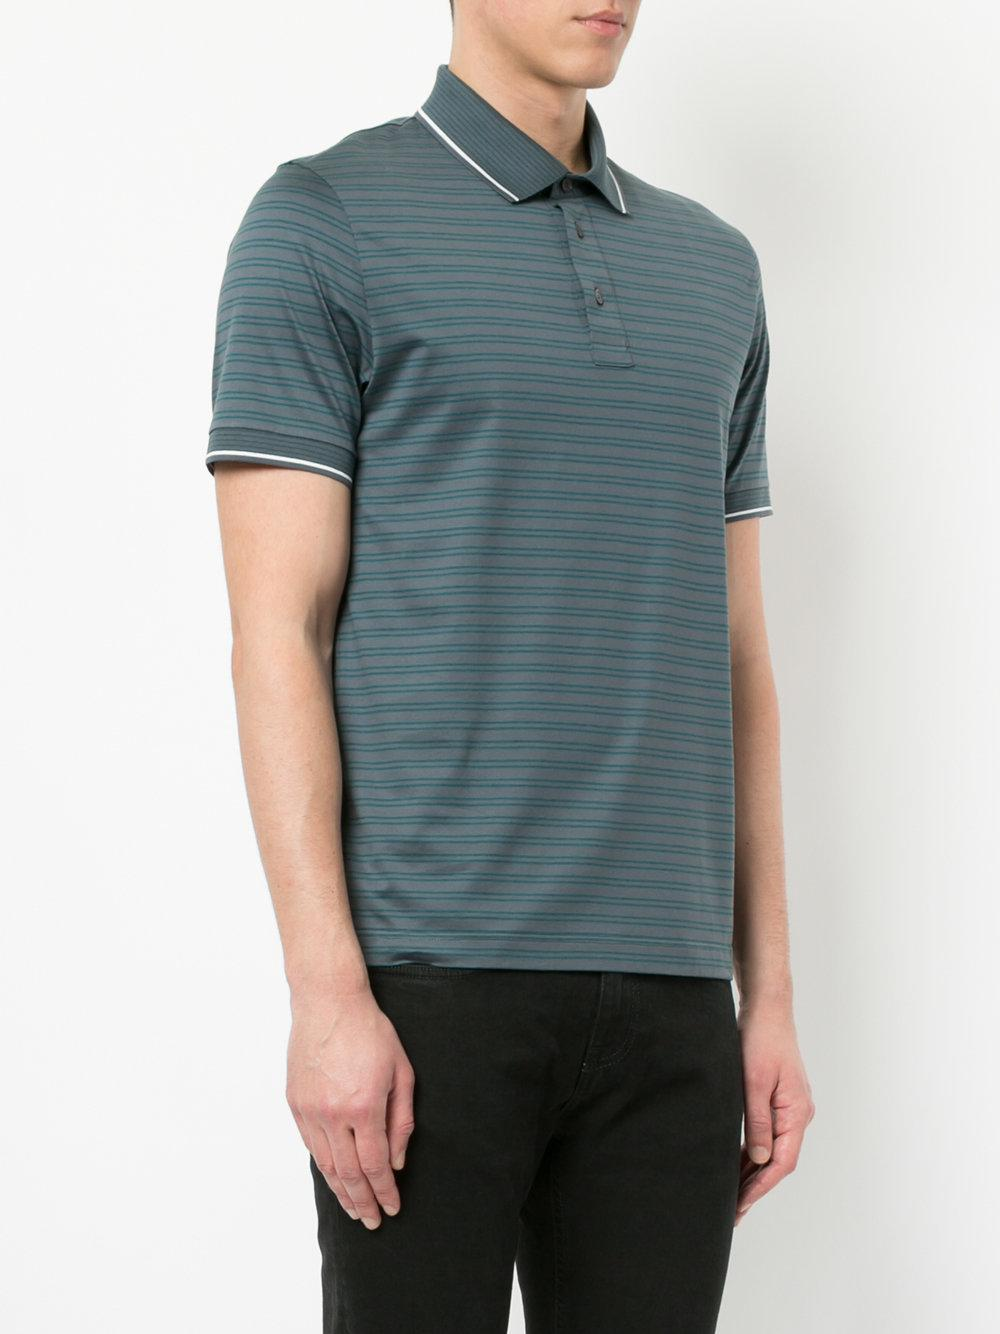 36b12db8 Cerruti 1881 - Gray Striped Polo Shirt for Men - Lyst. View fullscreen